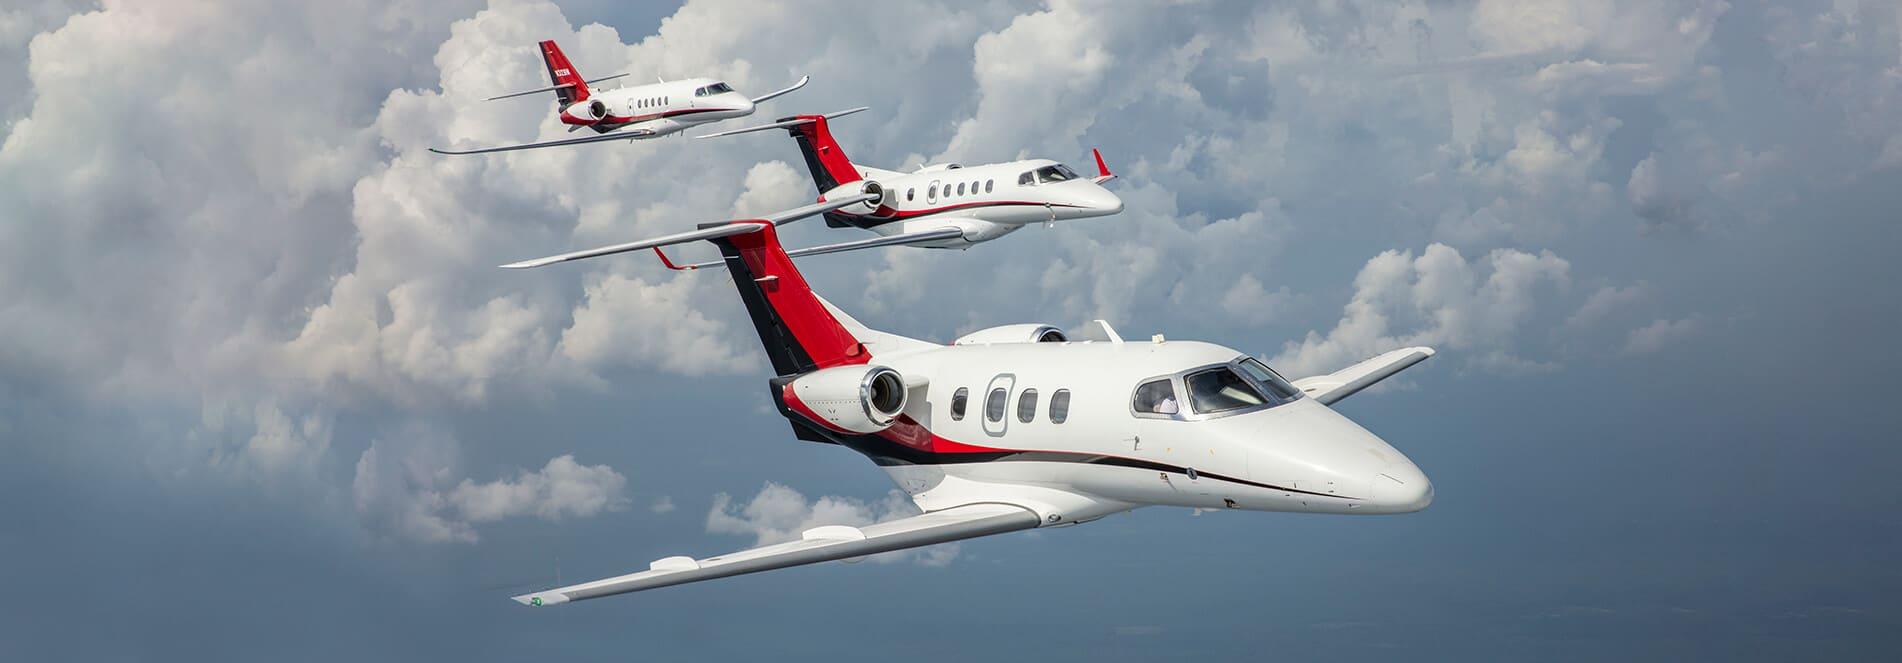 Embraer Phenom 100, Embraer Phenom 300, & Cessna Citation Latitude in Aerial Formation